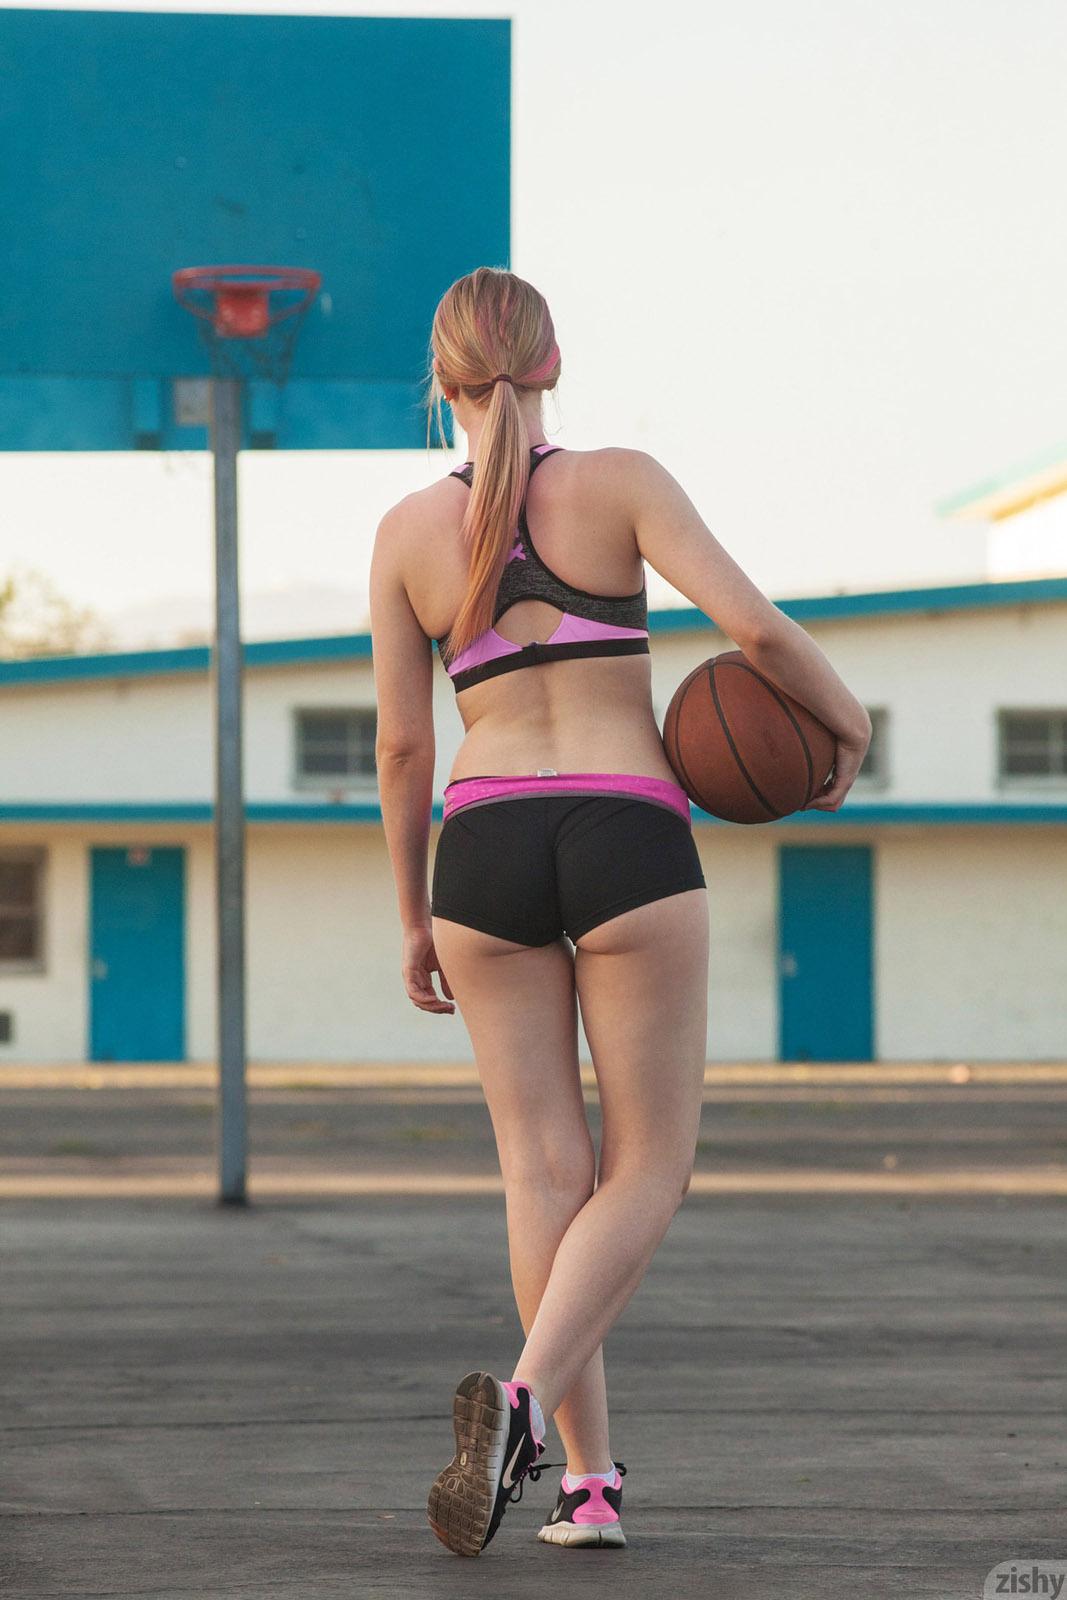 cherrynudes summer-carter-sporty-zishy 2 jpg